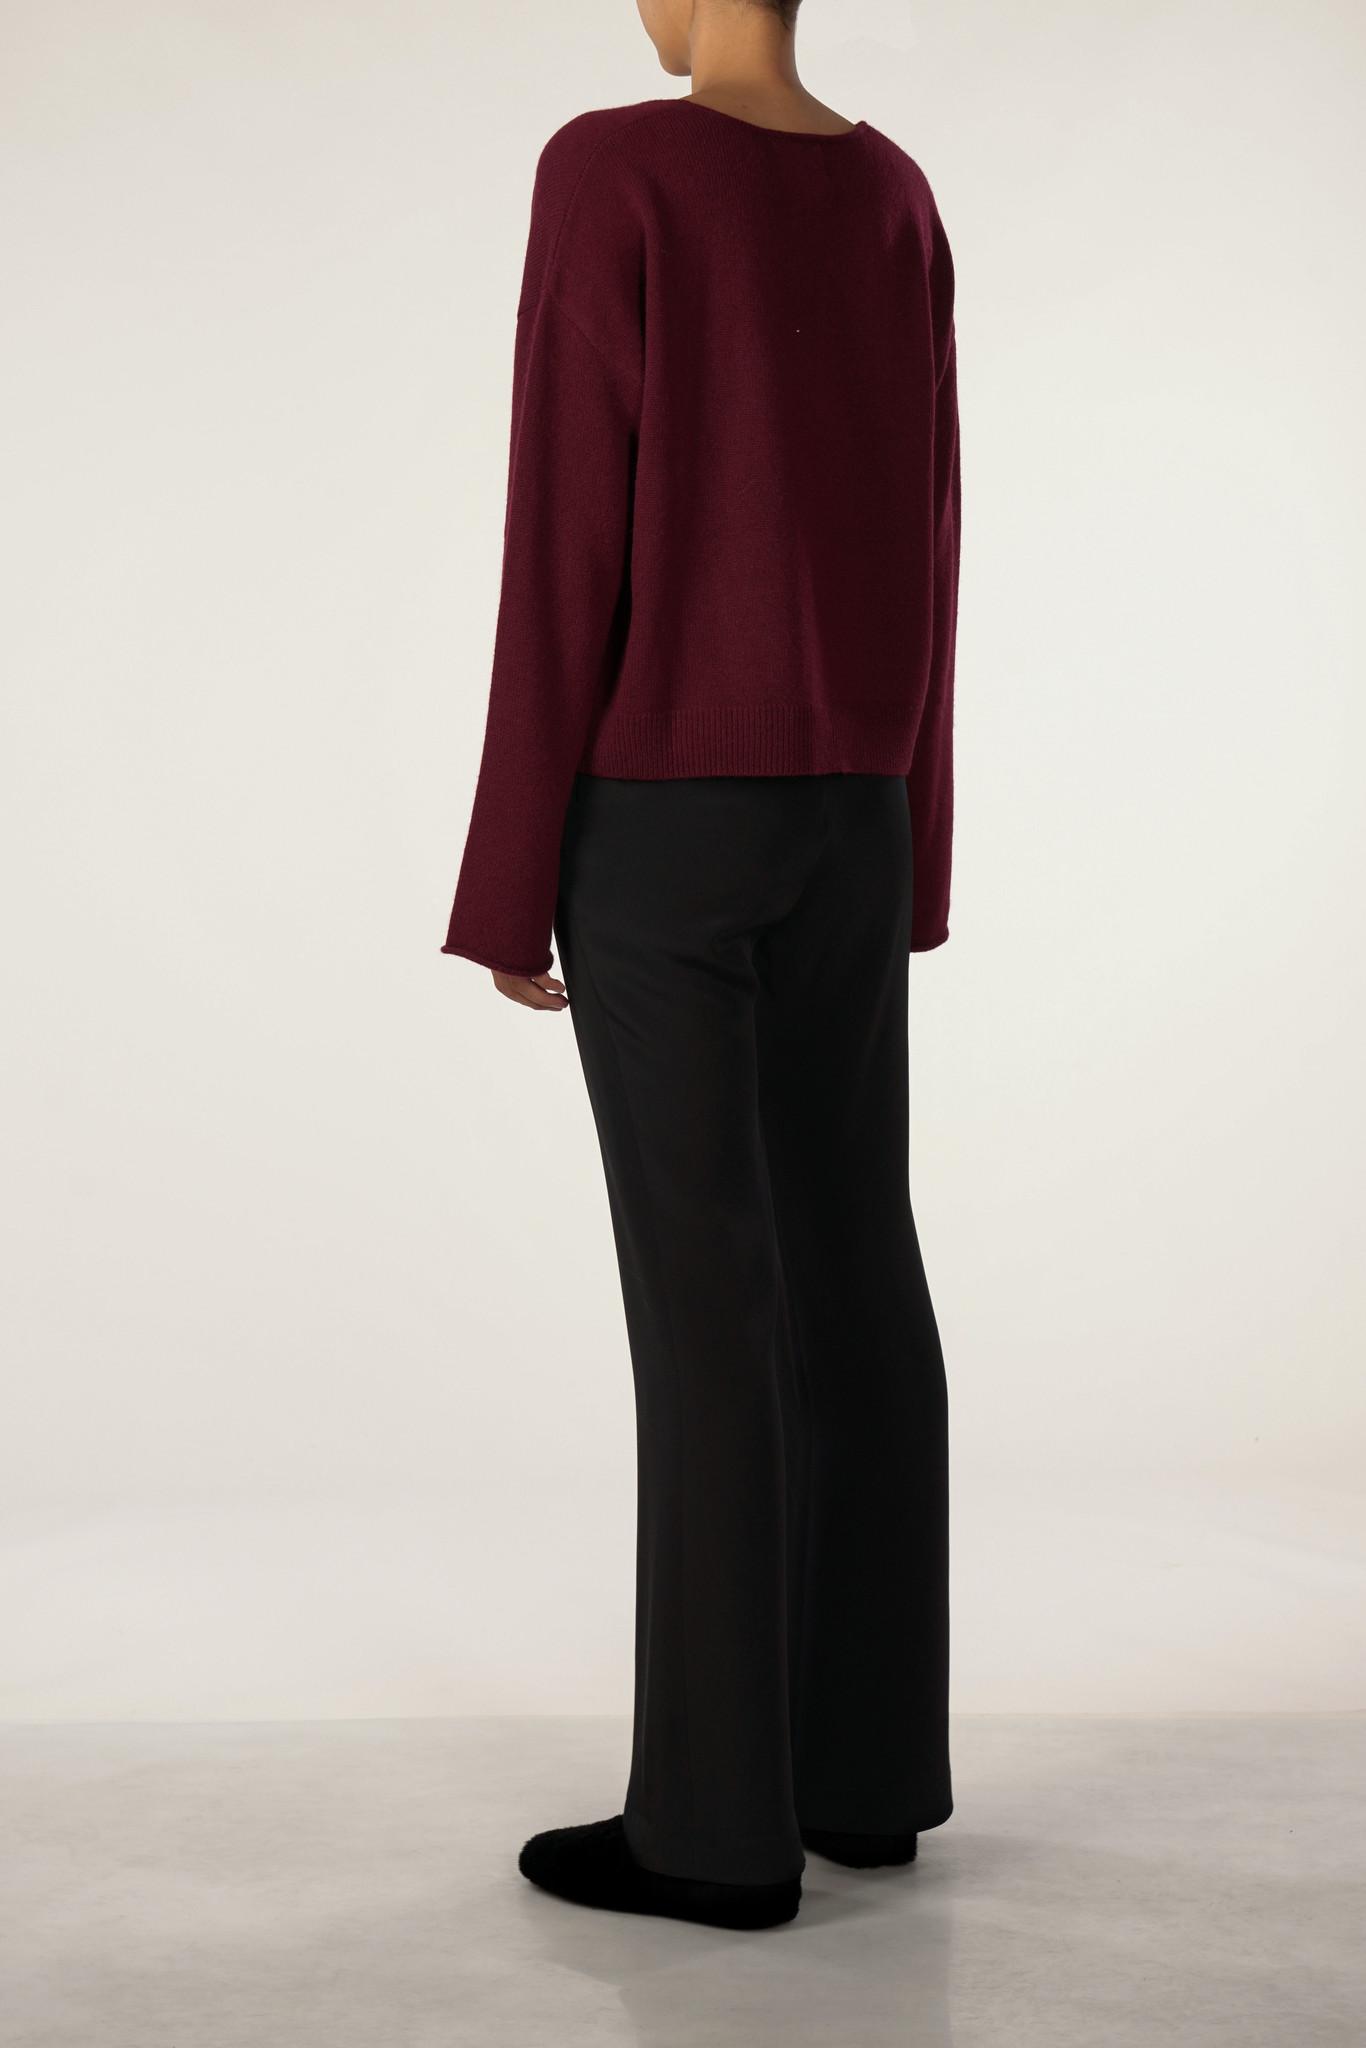 La  Collection Veronica Knit